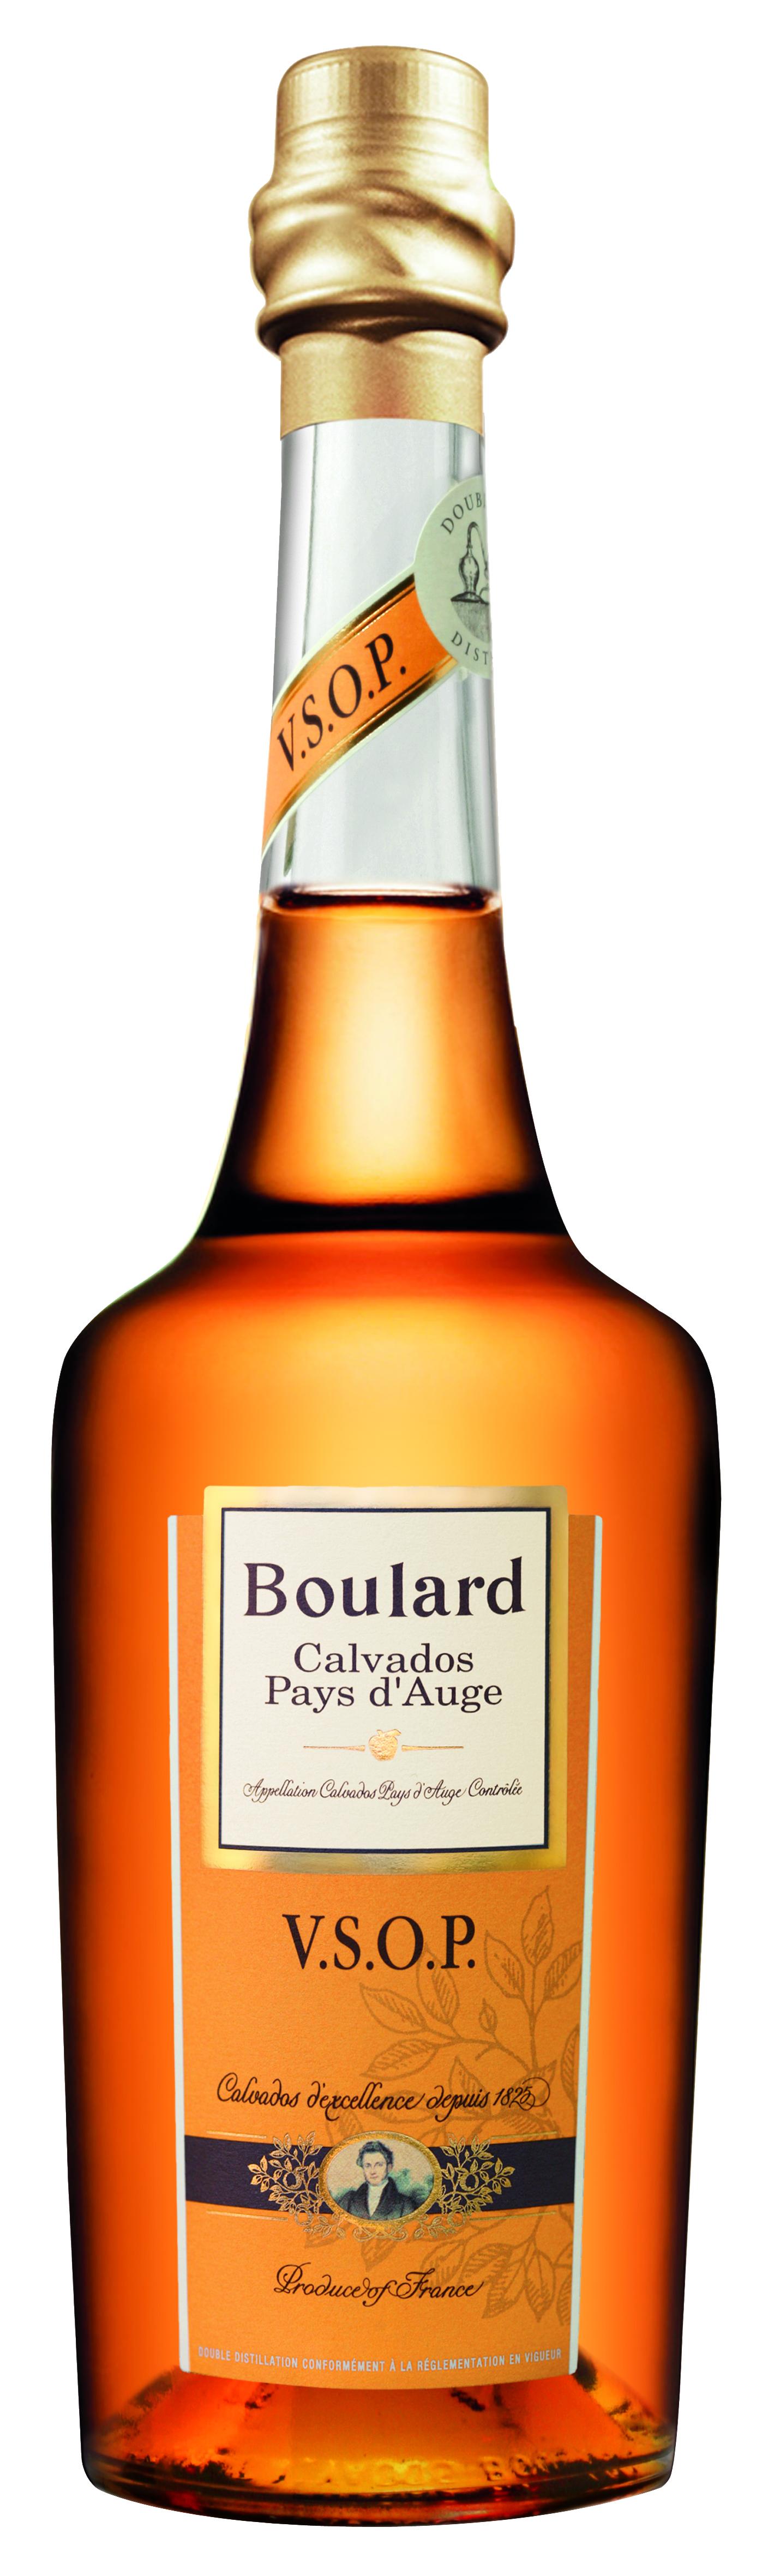 Boulard Calvados Pays d'Auge VSOP